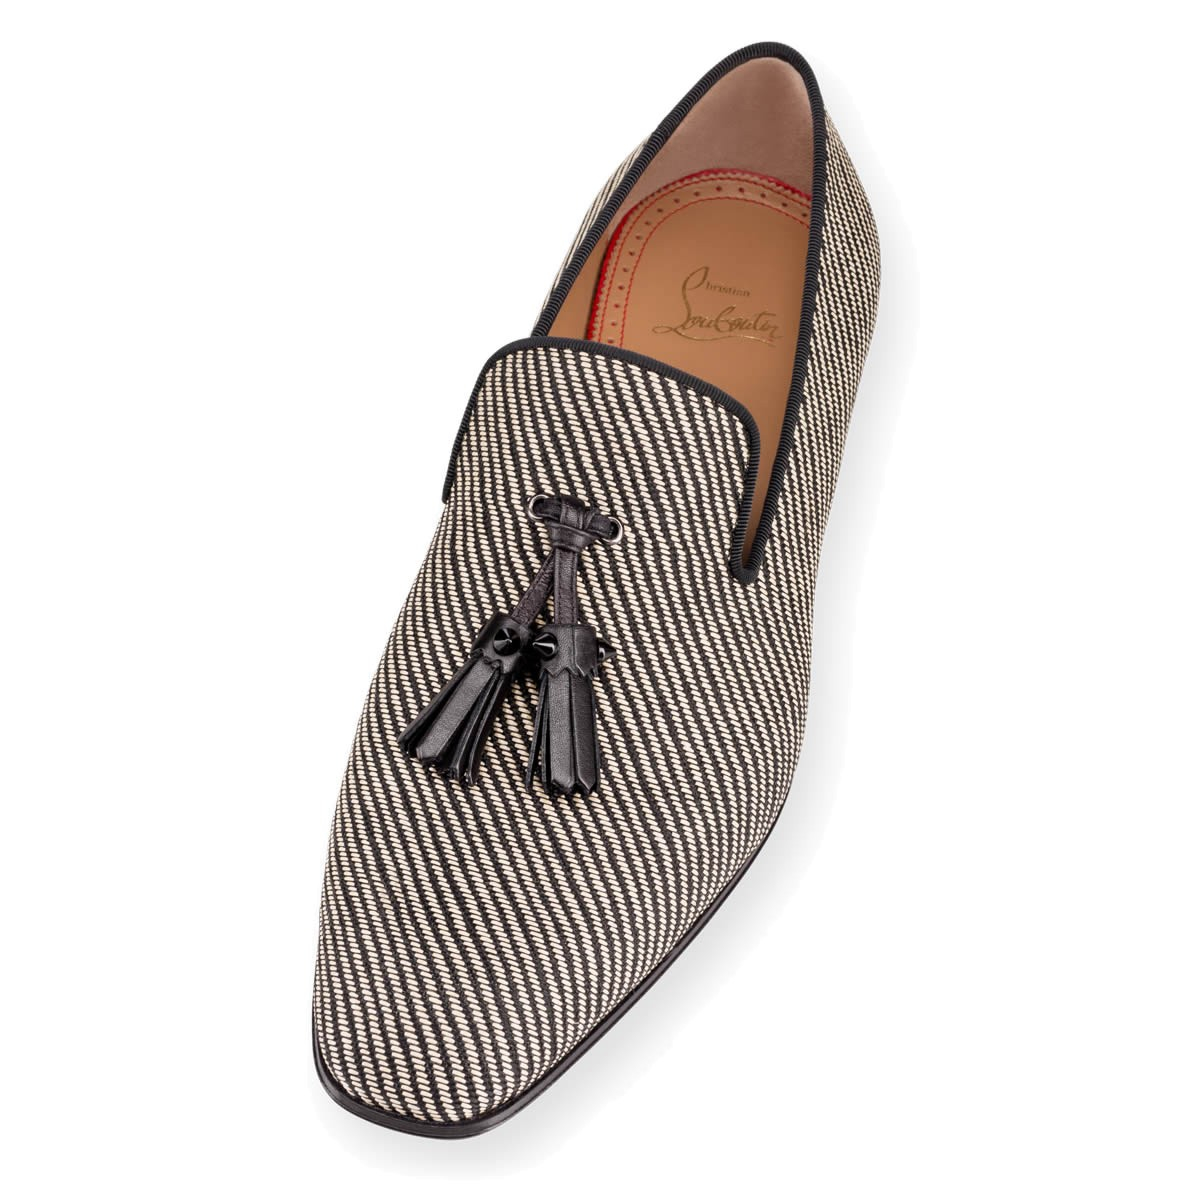 christian louboutin loafer pumps Brown tassels | cosmetics digital ...